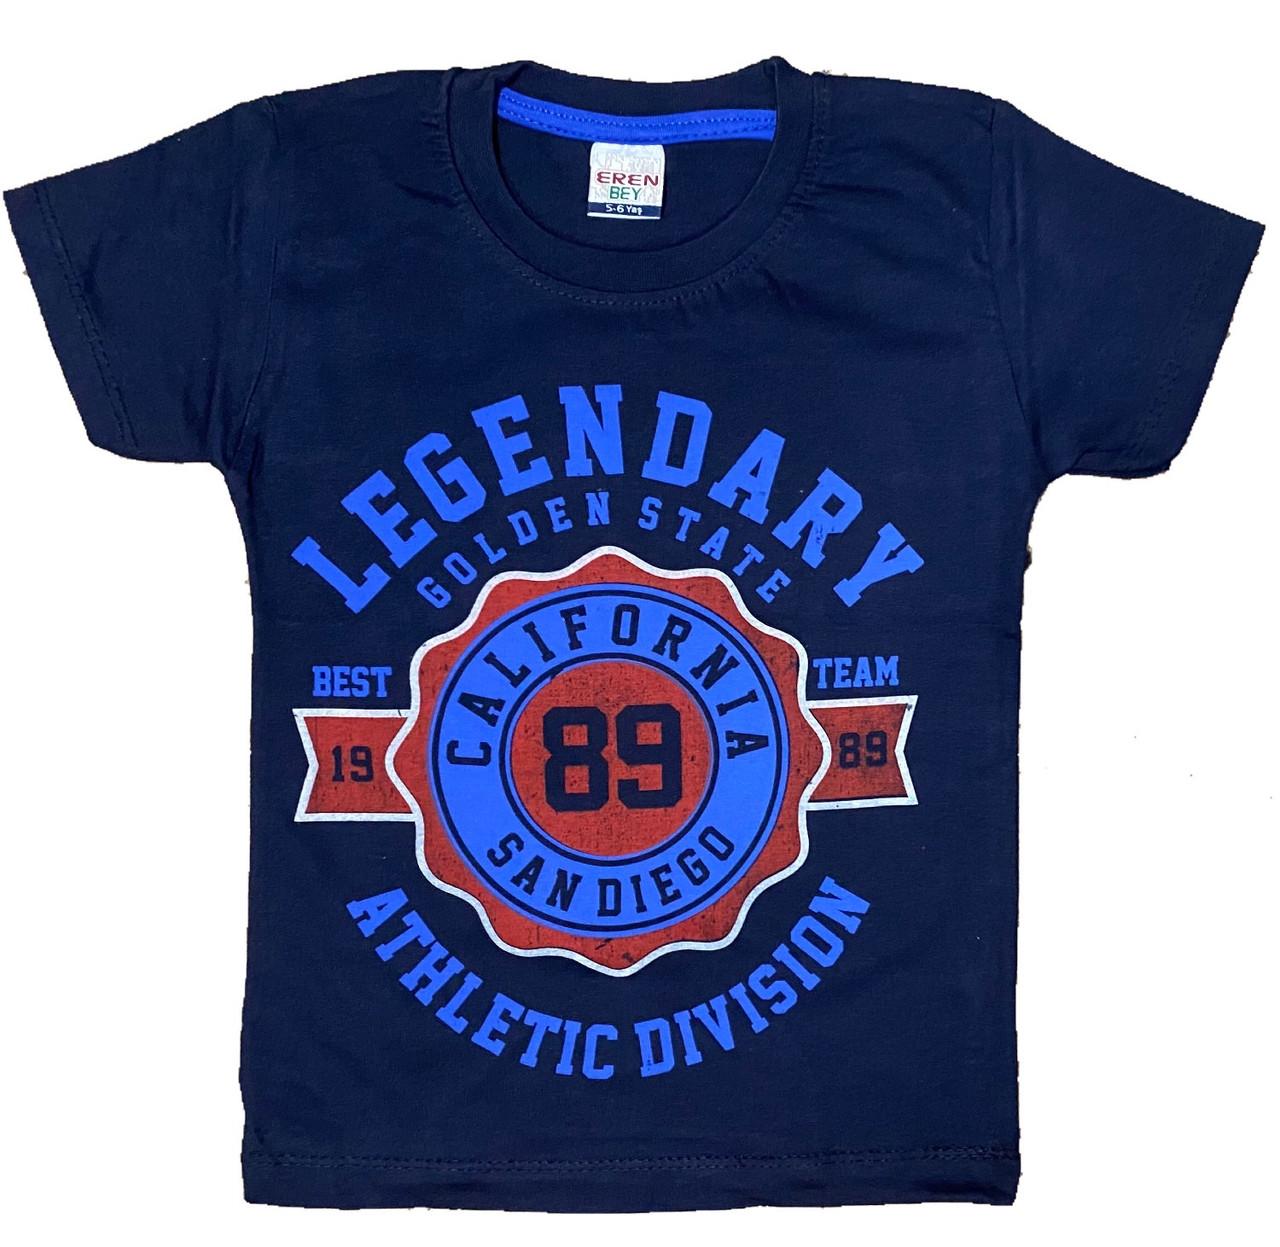 Дитяча футболка для хлопчика, 110см